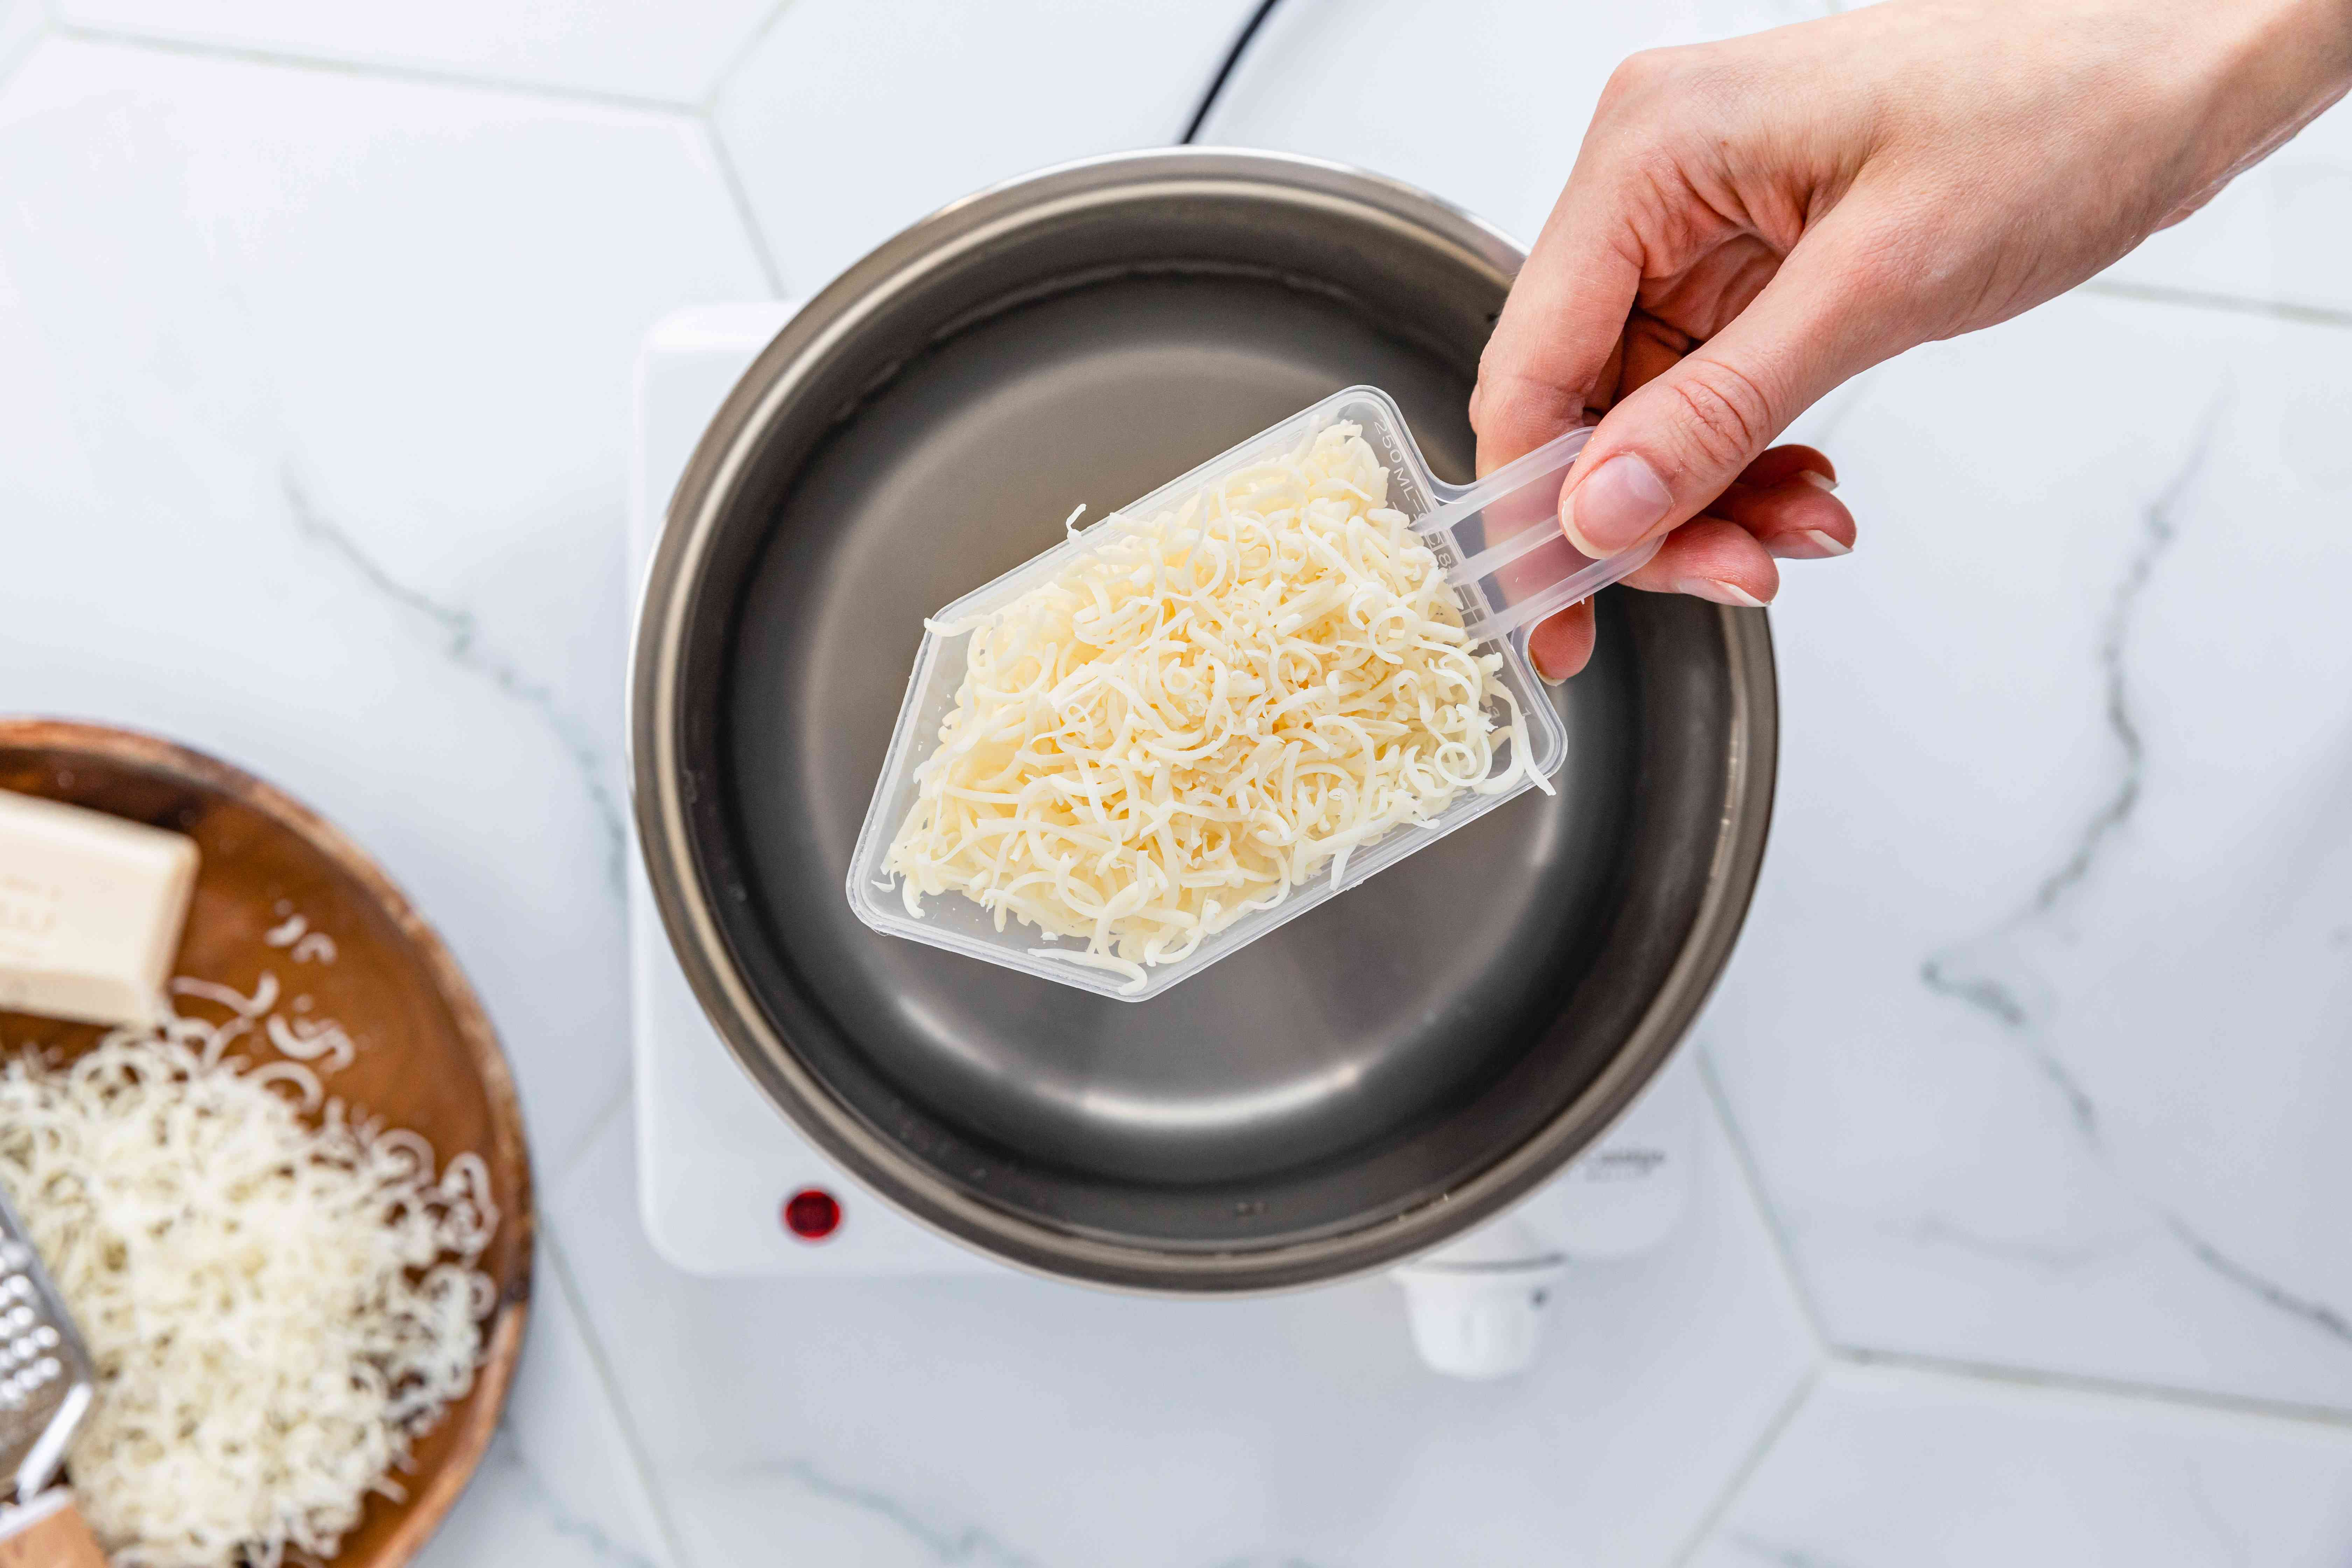 DIY liquid laundry detergent with grated soap in plastic scoop over saucepan